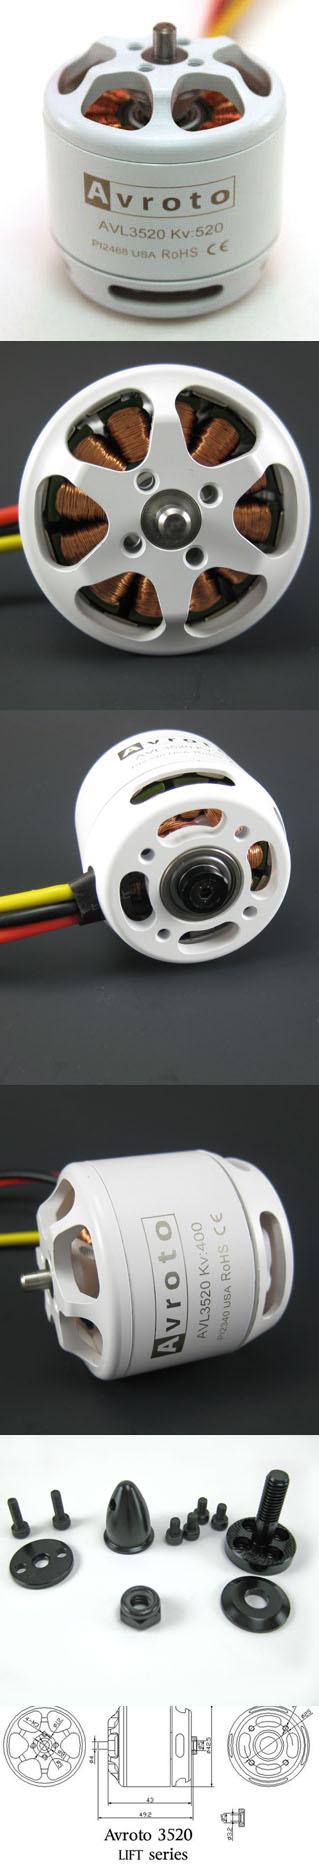 Avroto LIFT series 3520 520Kv Motor